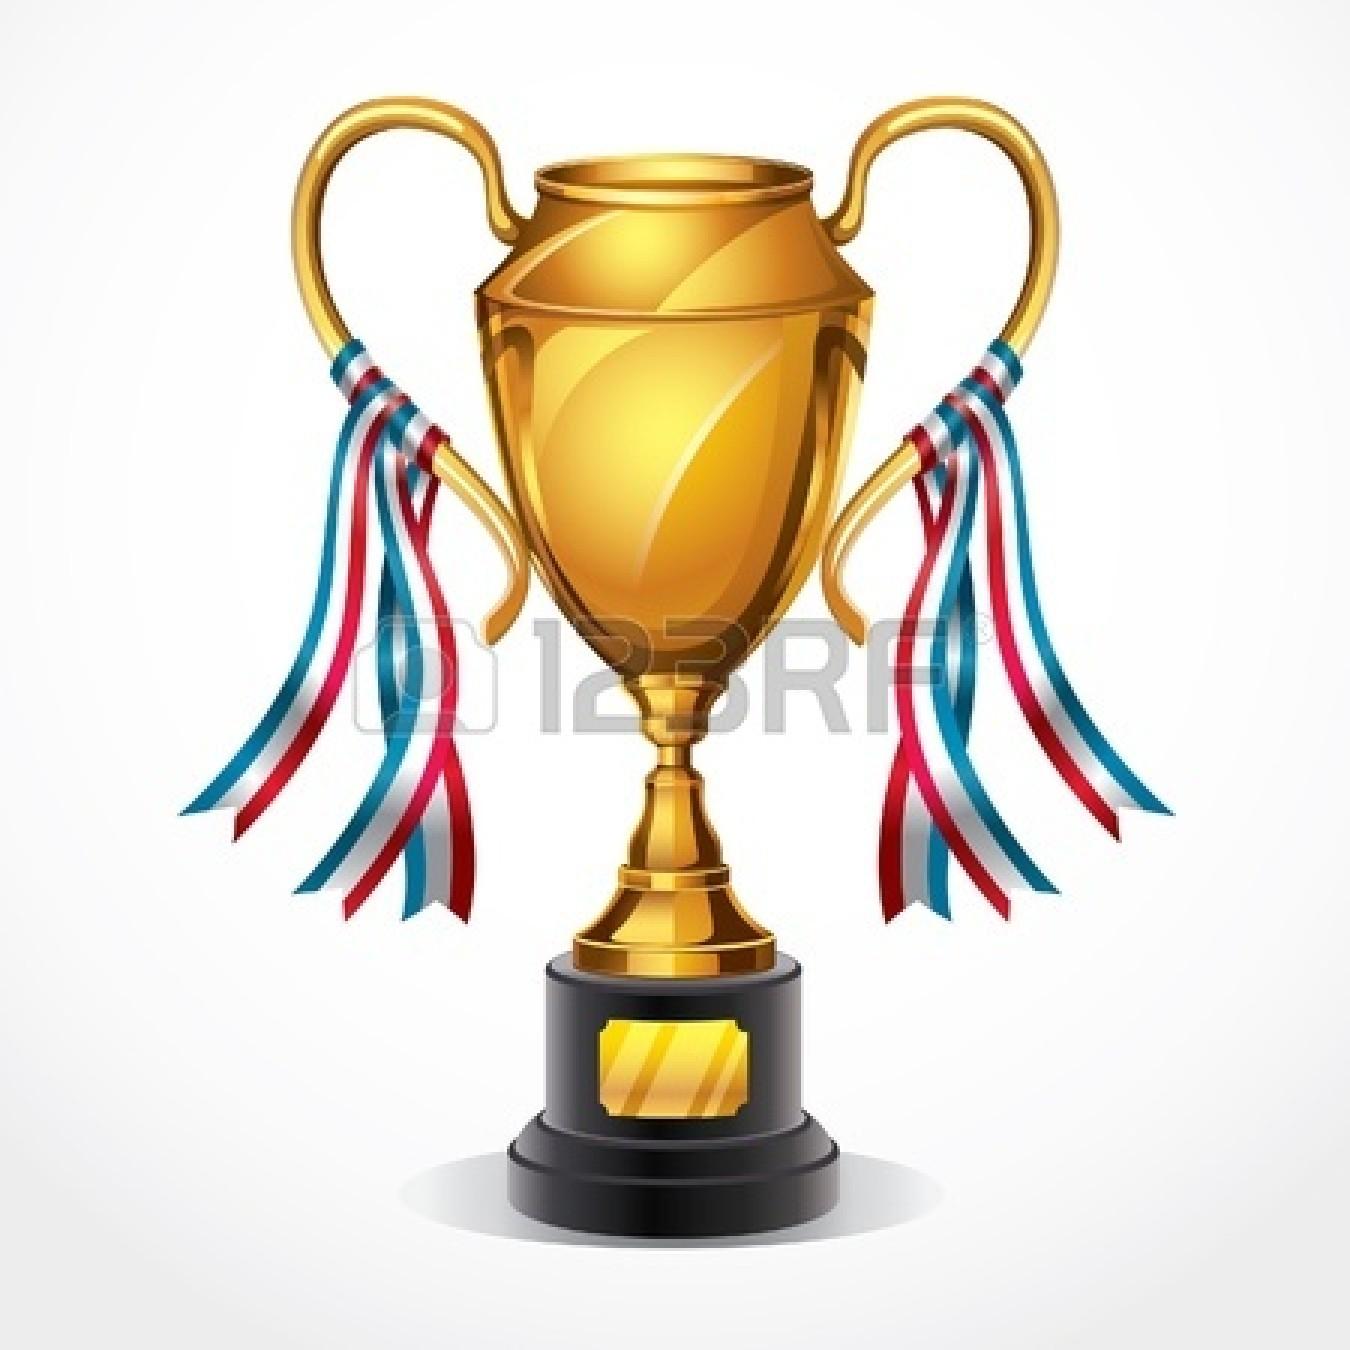 1350x1350 Winning Clipart Championship Trophy